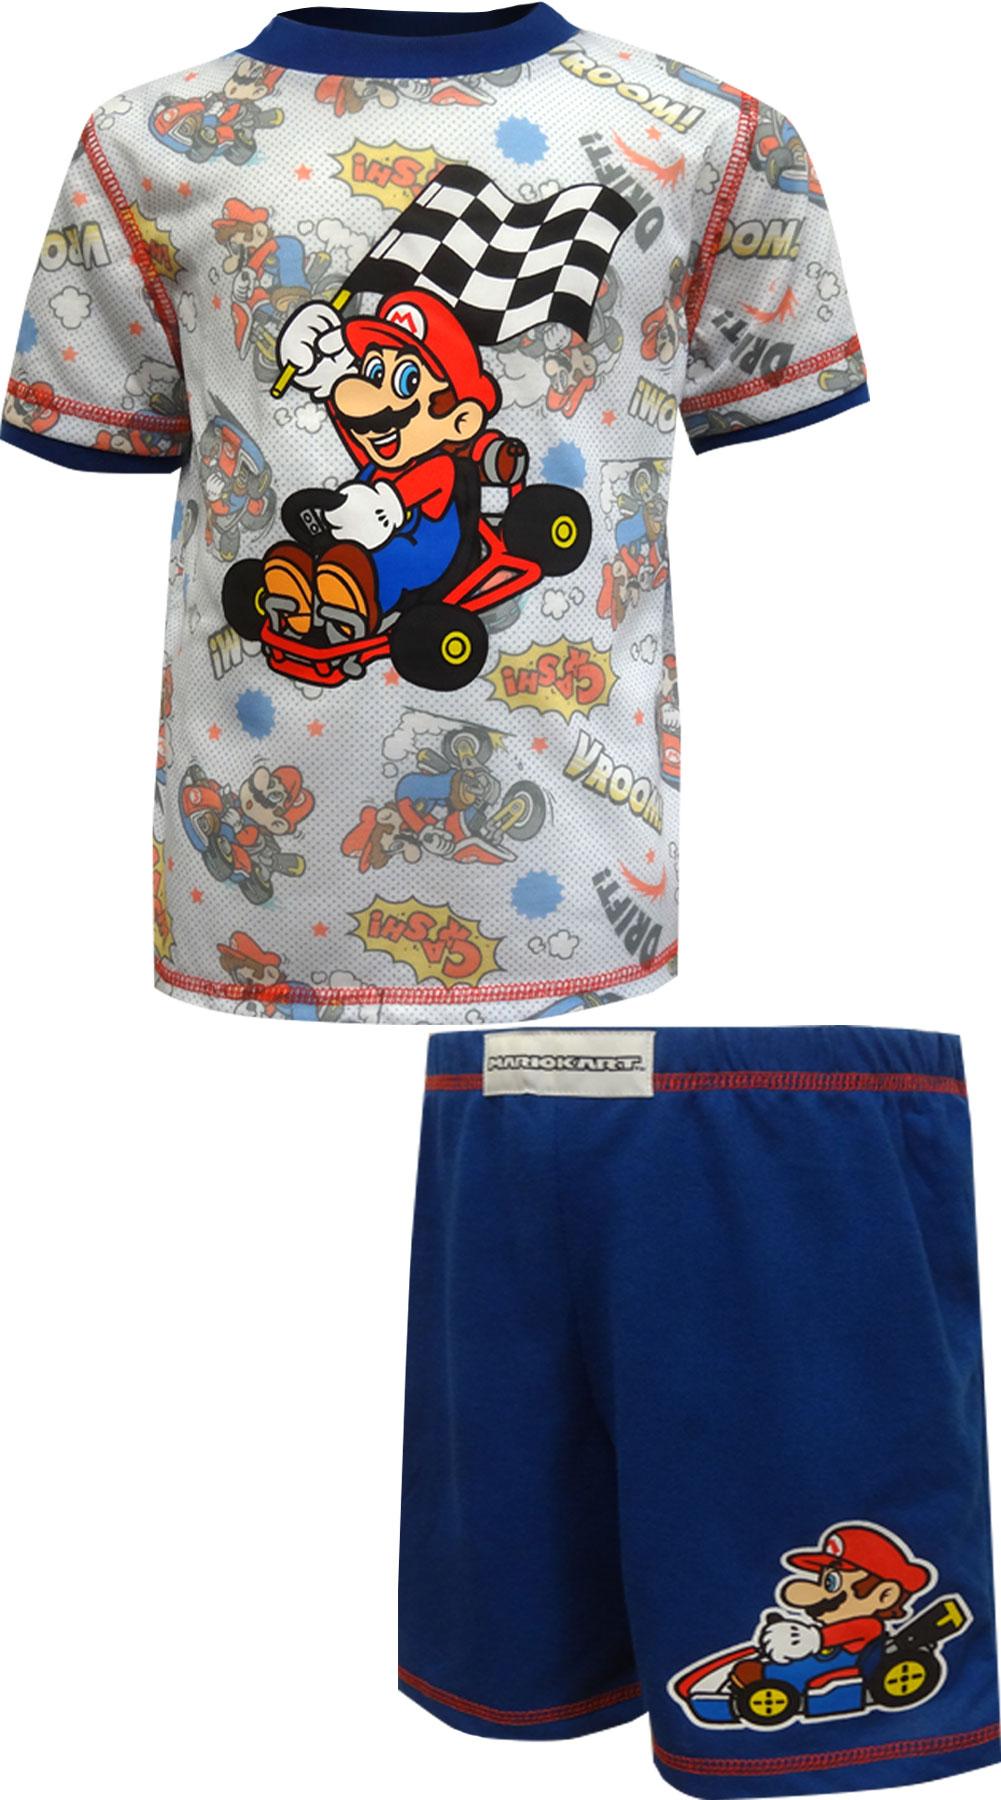 Image of MarioKart Vroom Cash Drift Pajamas for boys